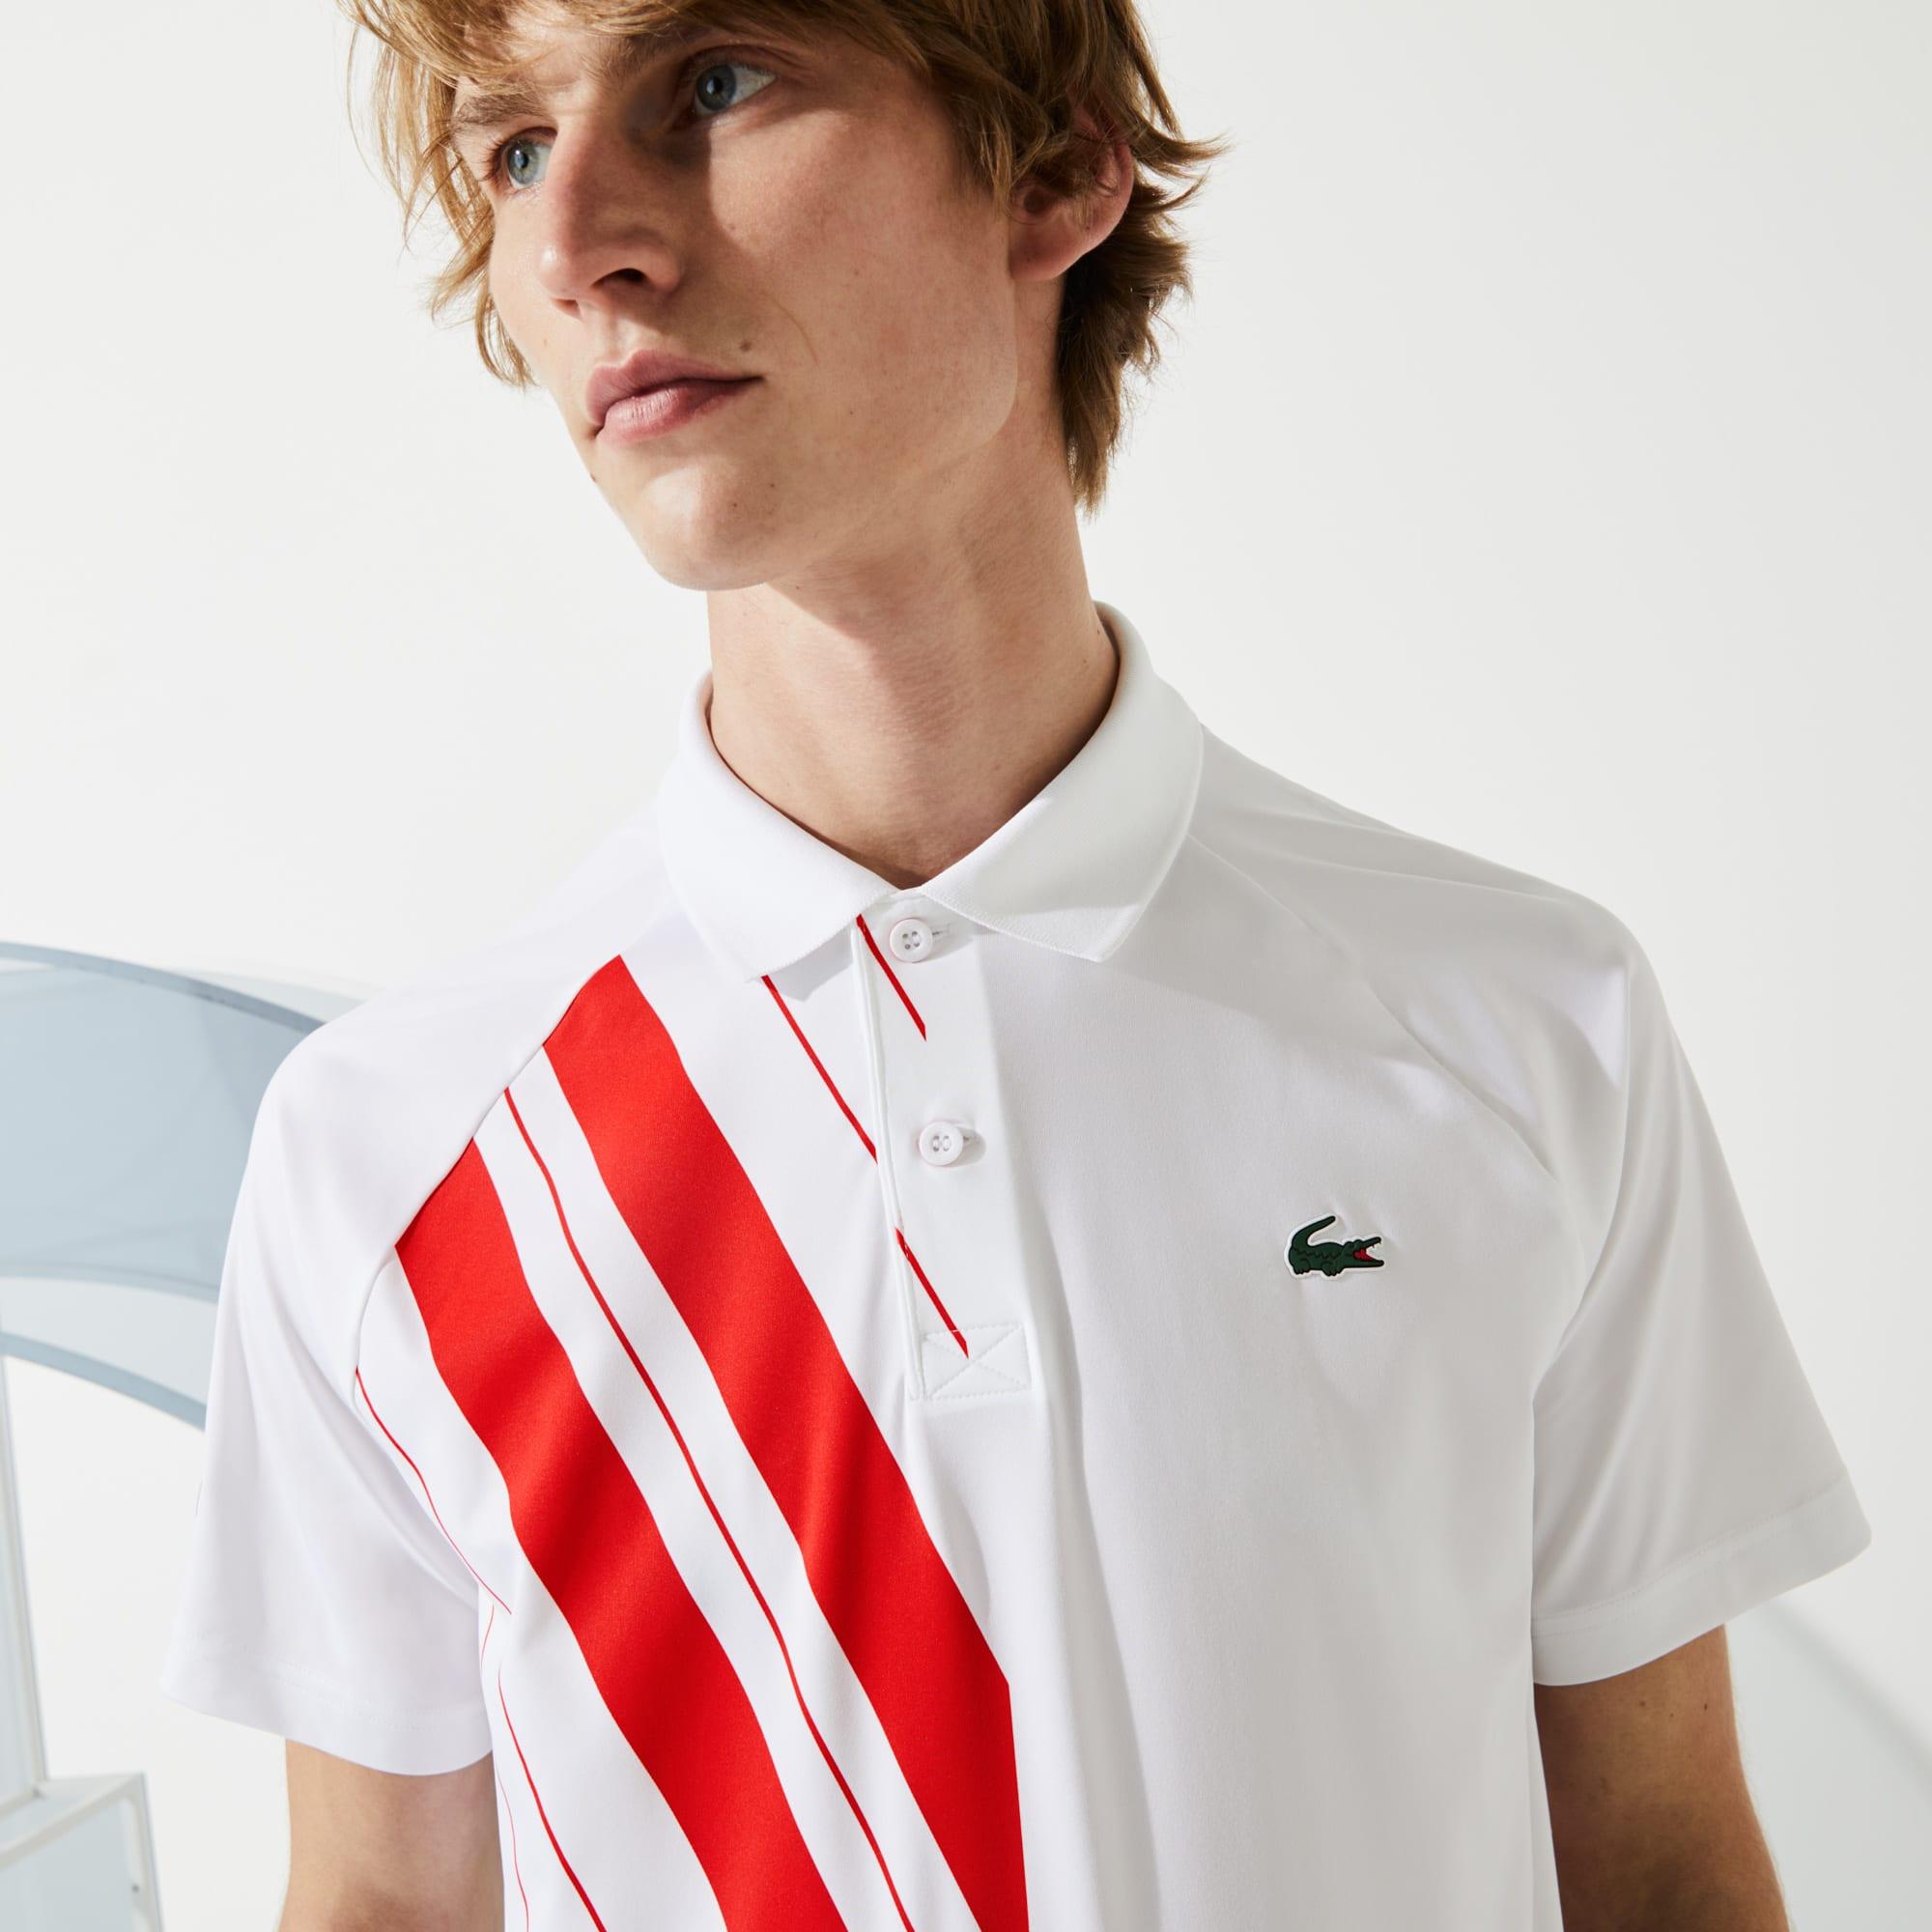 Lacoste Mens SPORT x Novak Djokovic Print Stretch Jersey Polo Shirt